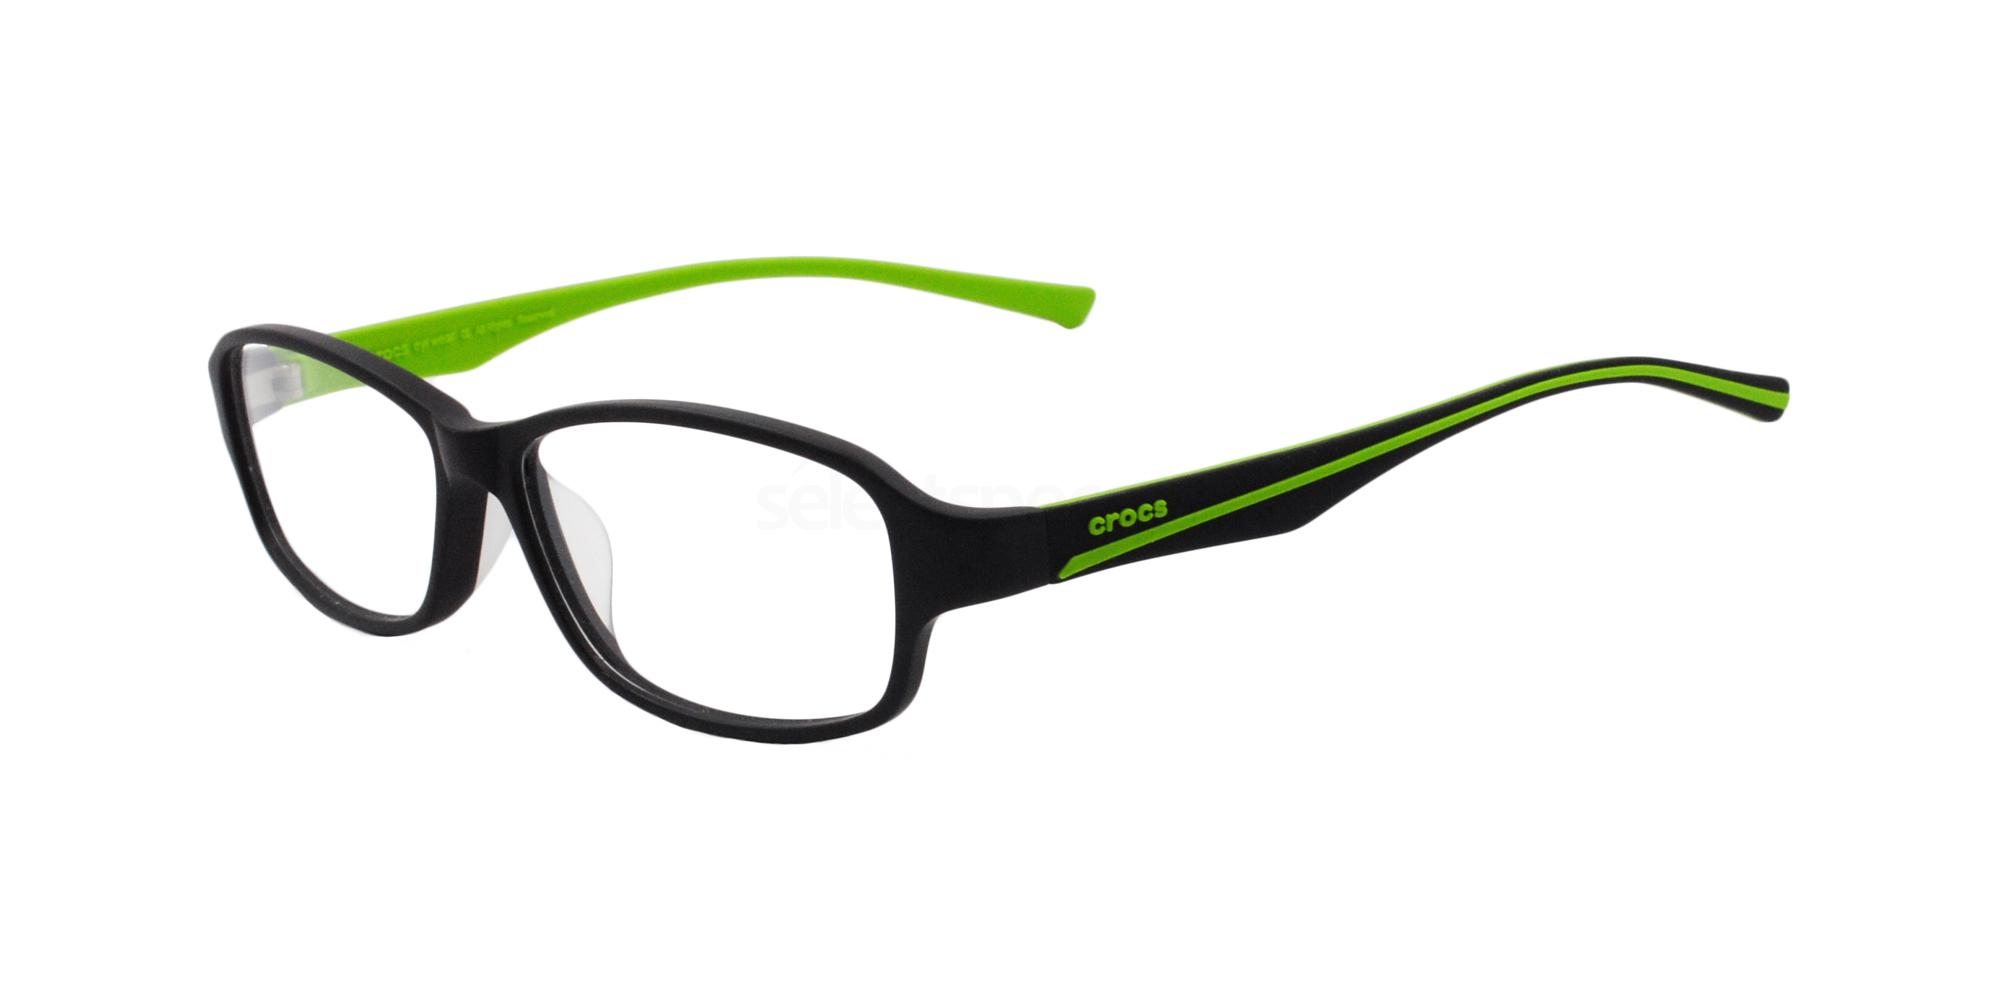 20GN CF3018 Glasses, Crocs Eyewear